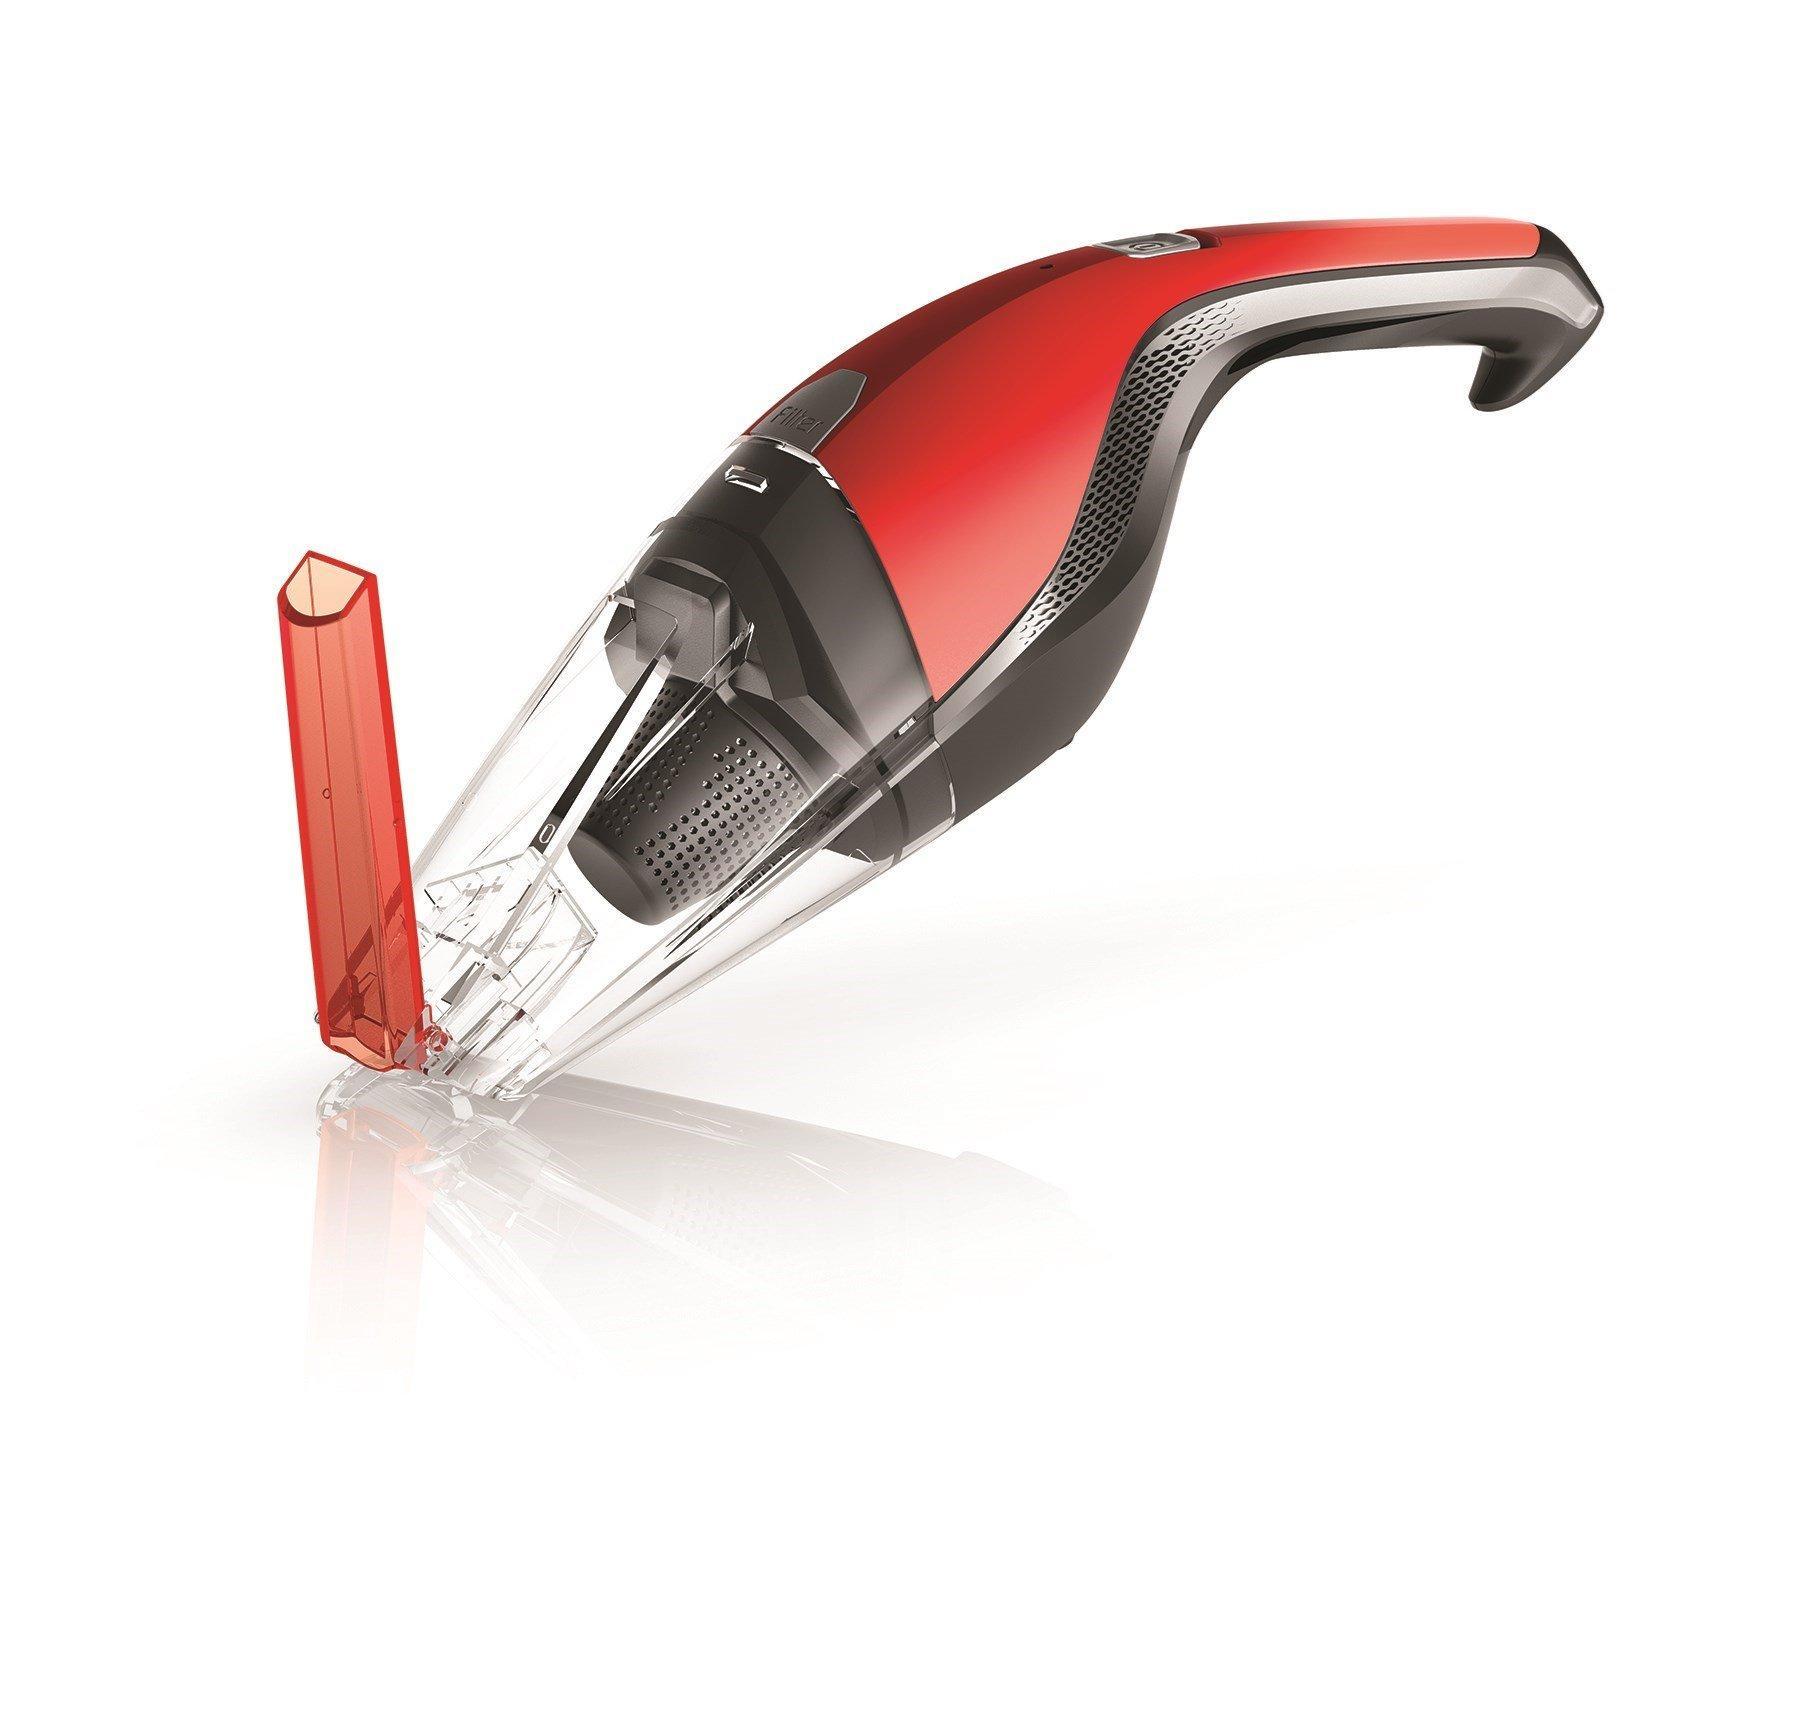 Quick Flip 12V Cordless Hand Vacuum2